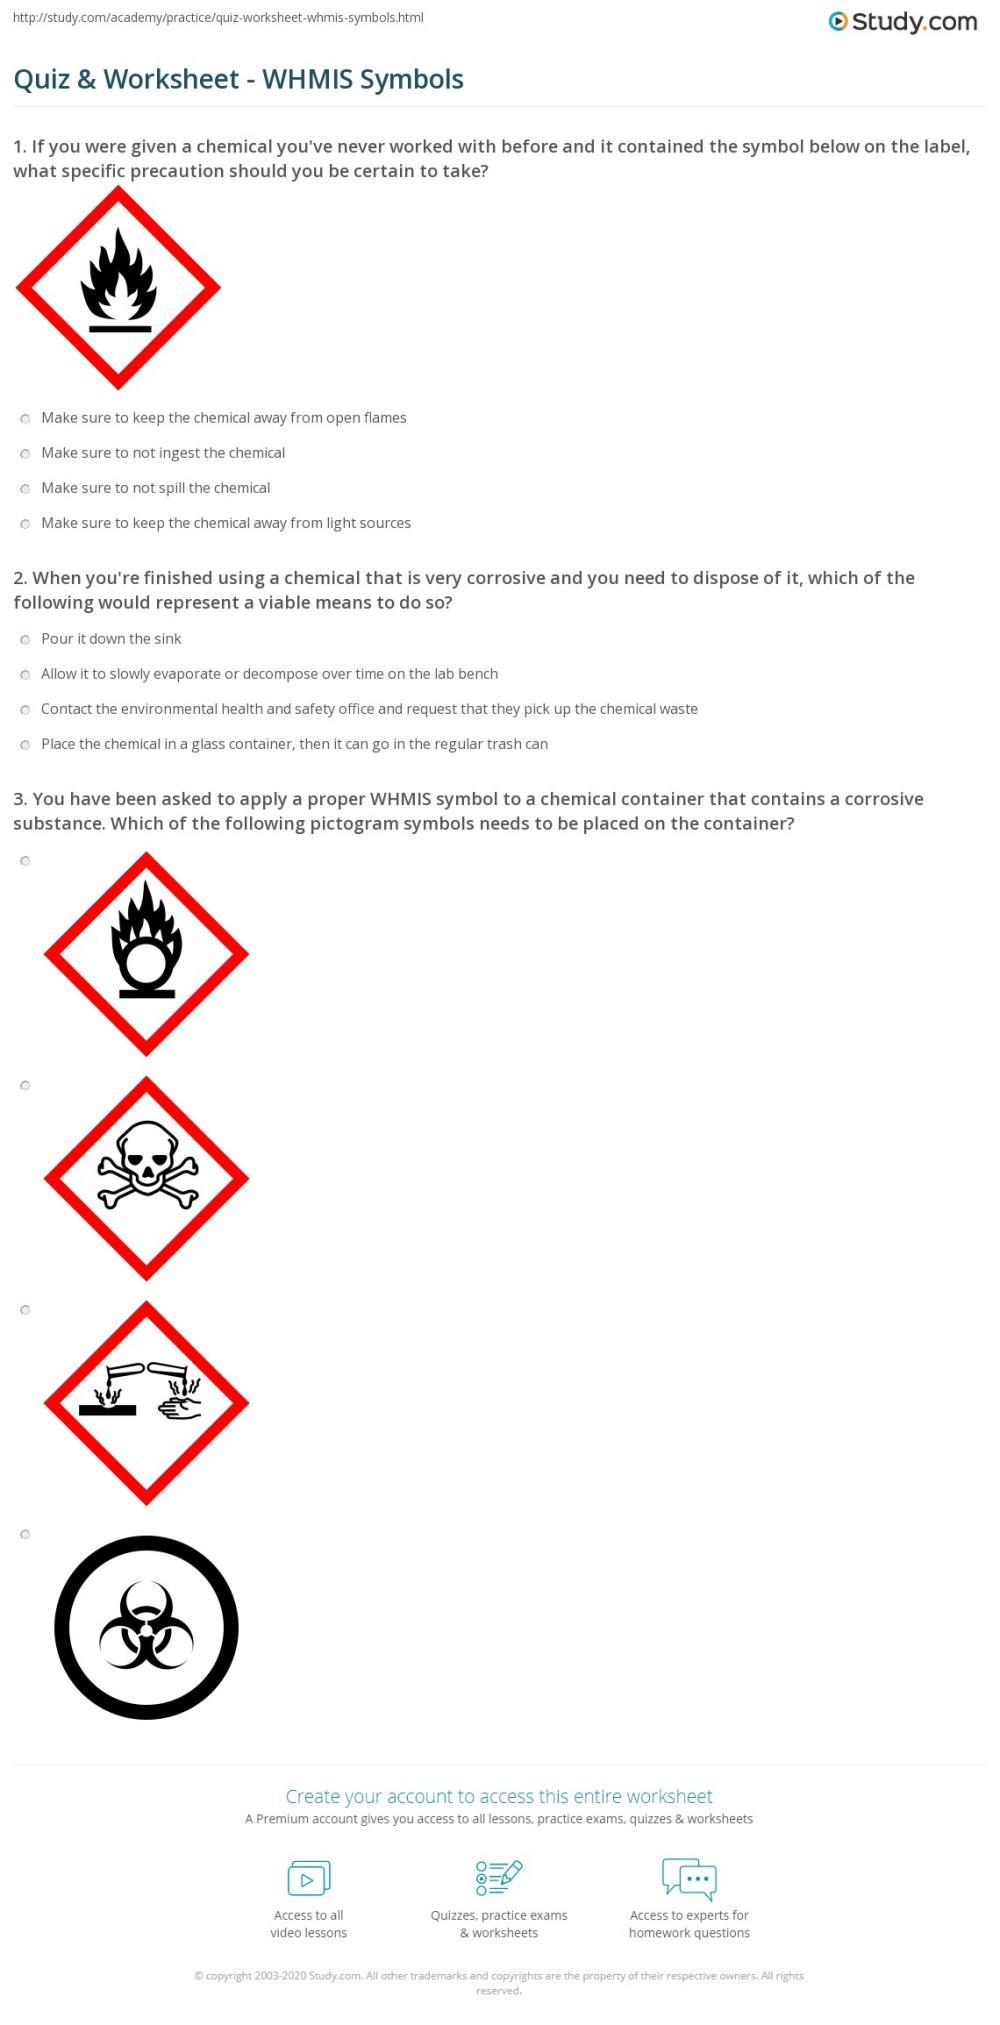 medium resolution of Quiz \u0026 Worksheet - WHMIS Symbols   Study.com